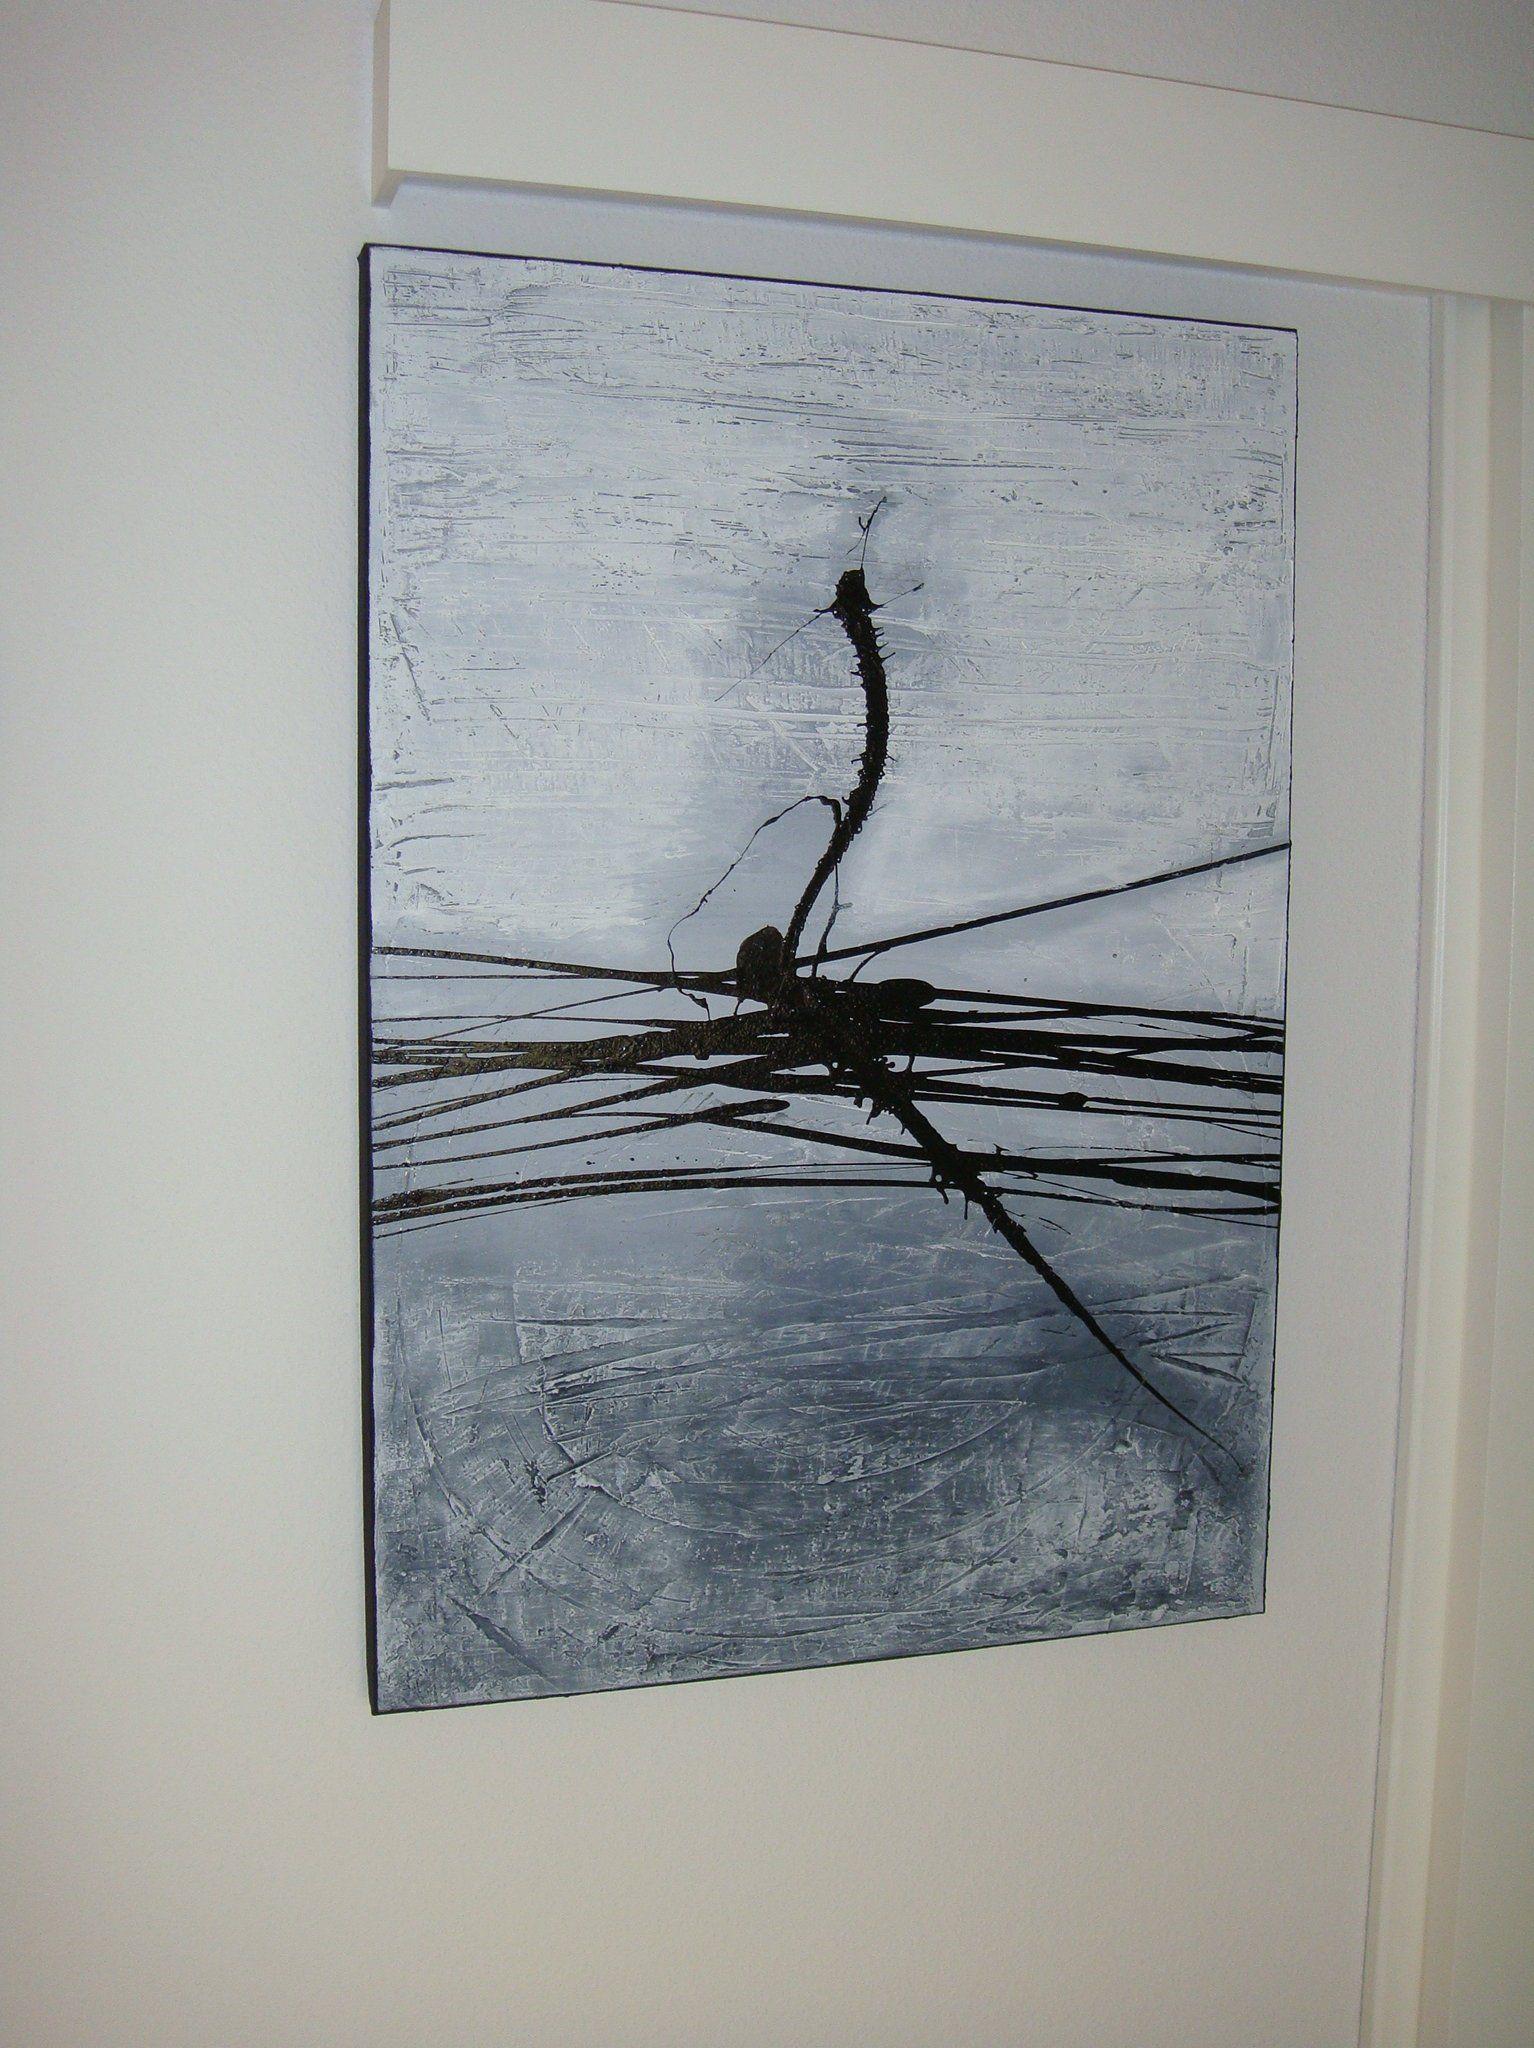 abstract image inspiration 70x100 picture in grey tones modern plain art painting black and white bilder abstrakt grau weiß abstrakte kunst leinwand kaufen